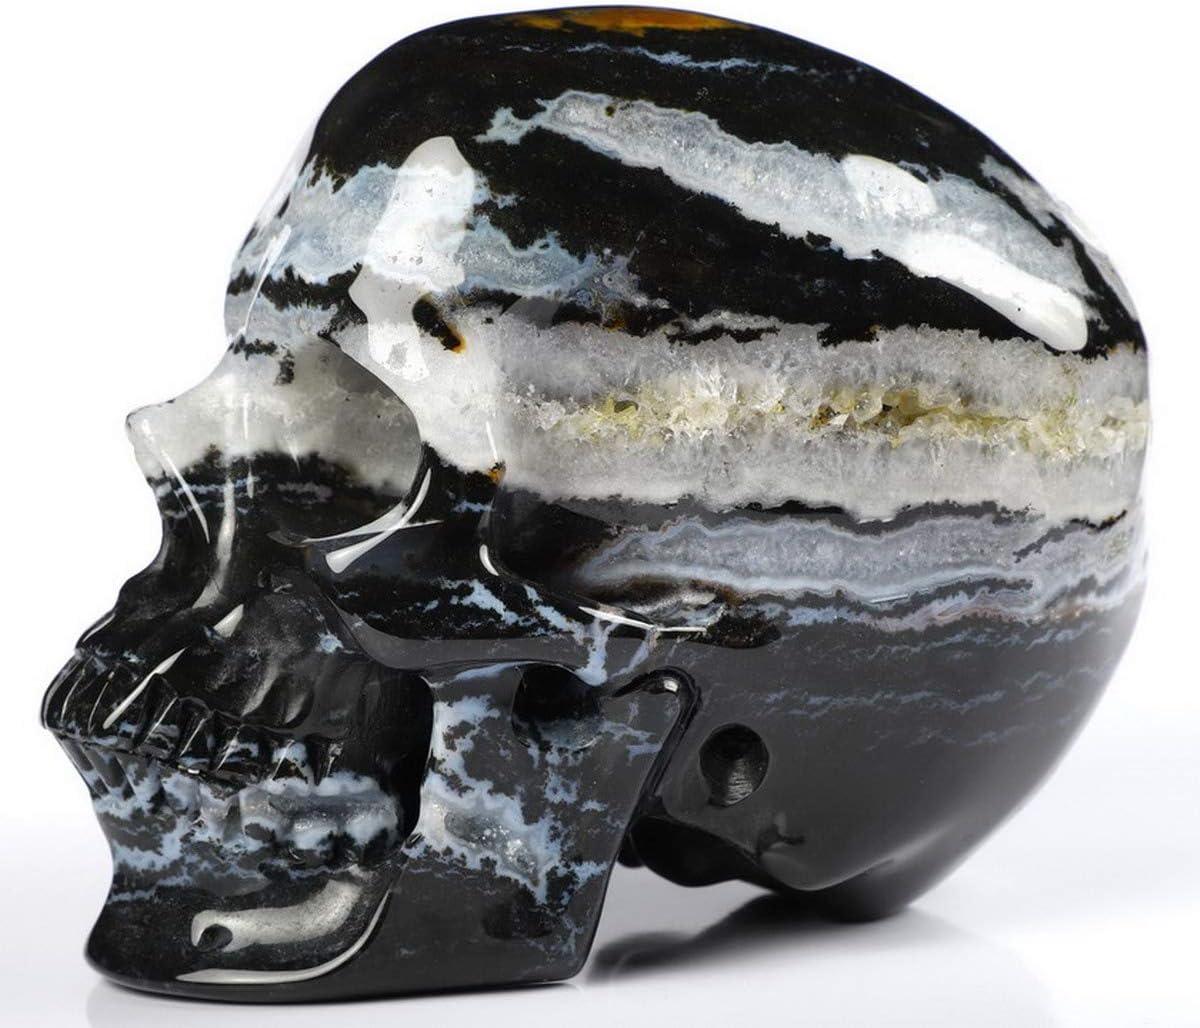 Crystal skulls ~ Zebra agate skulls ~ Crystal agate skulls ~ Skull decor